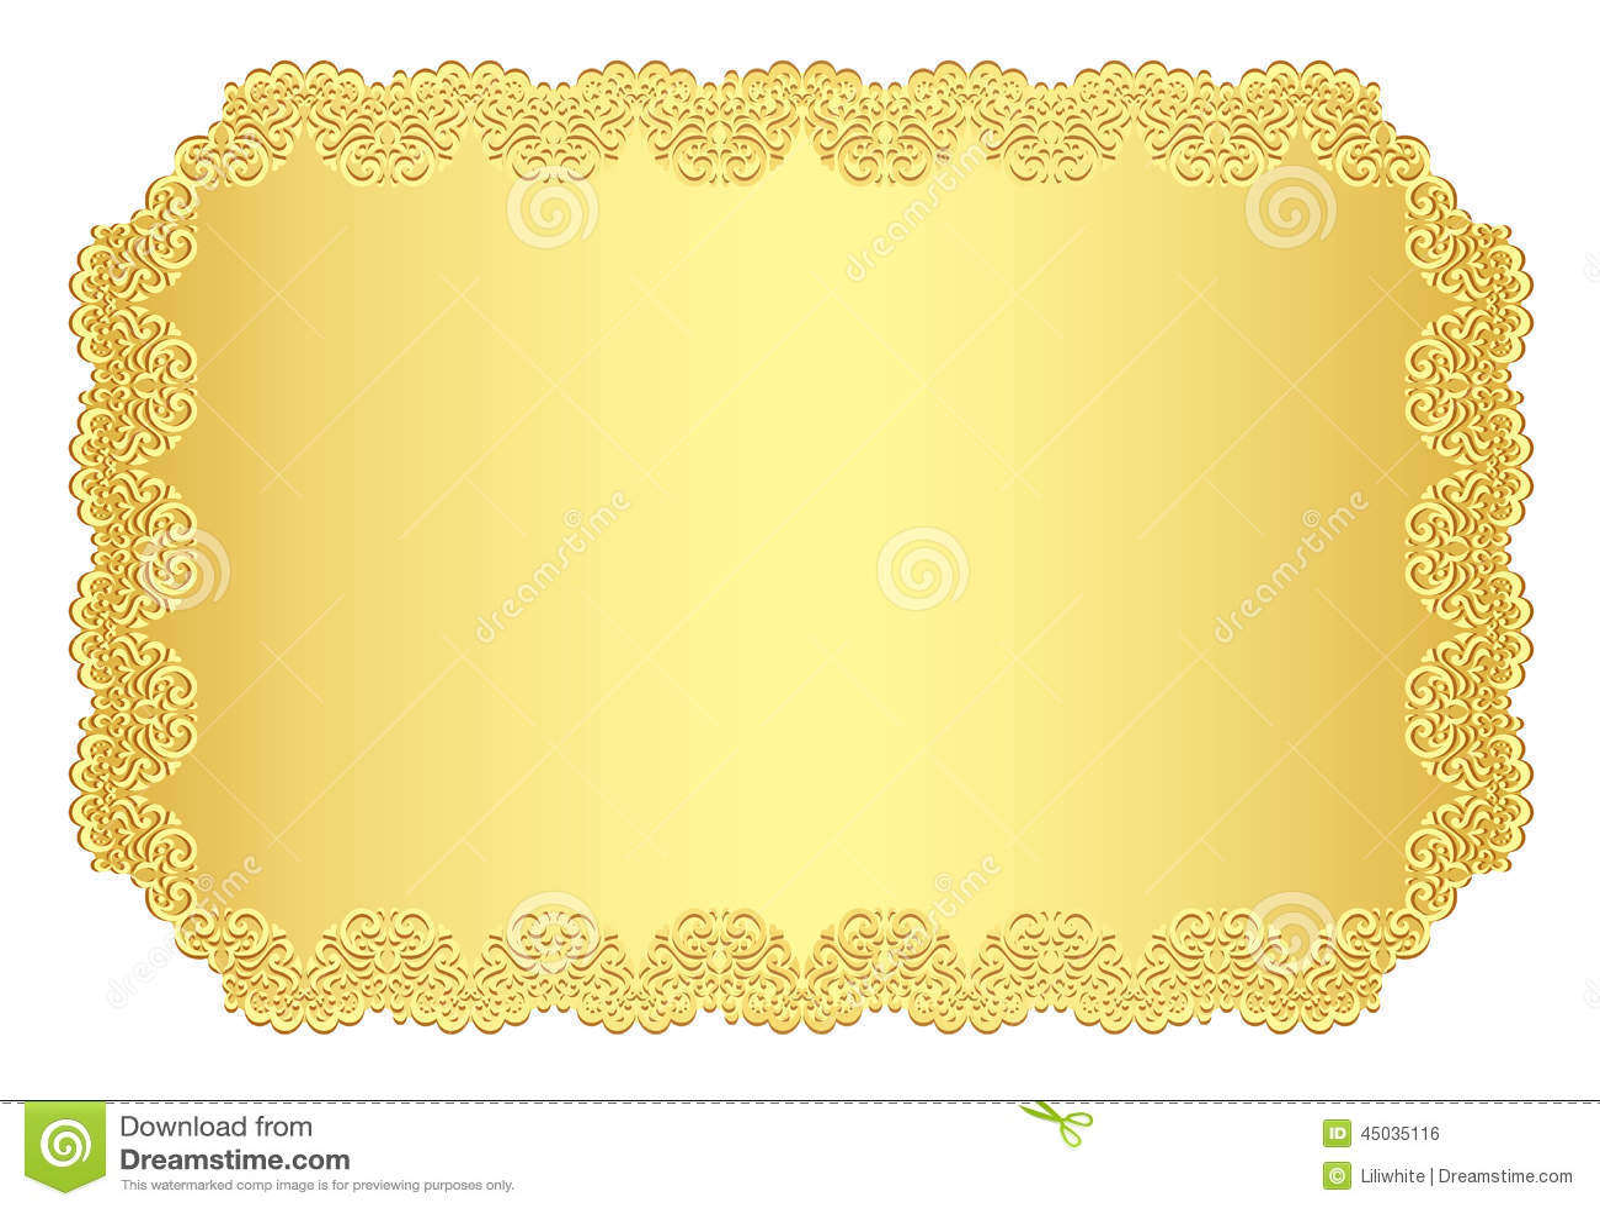 Golden Ticket Invitation Template. free printable golden ticket ...